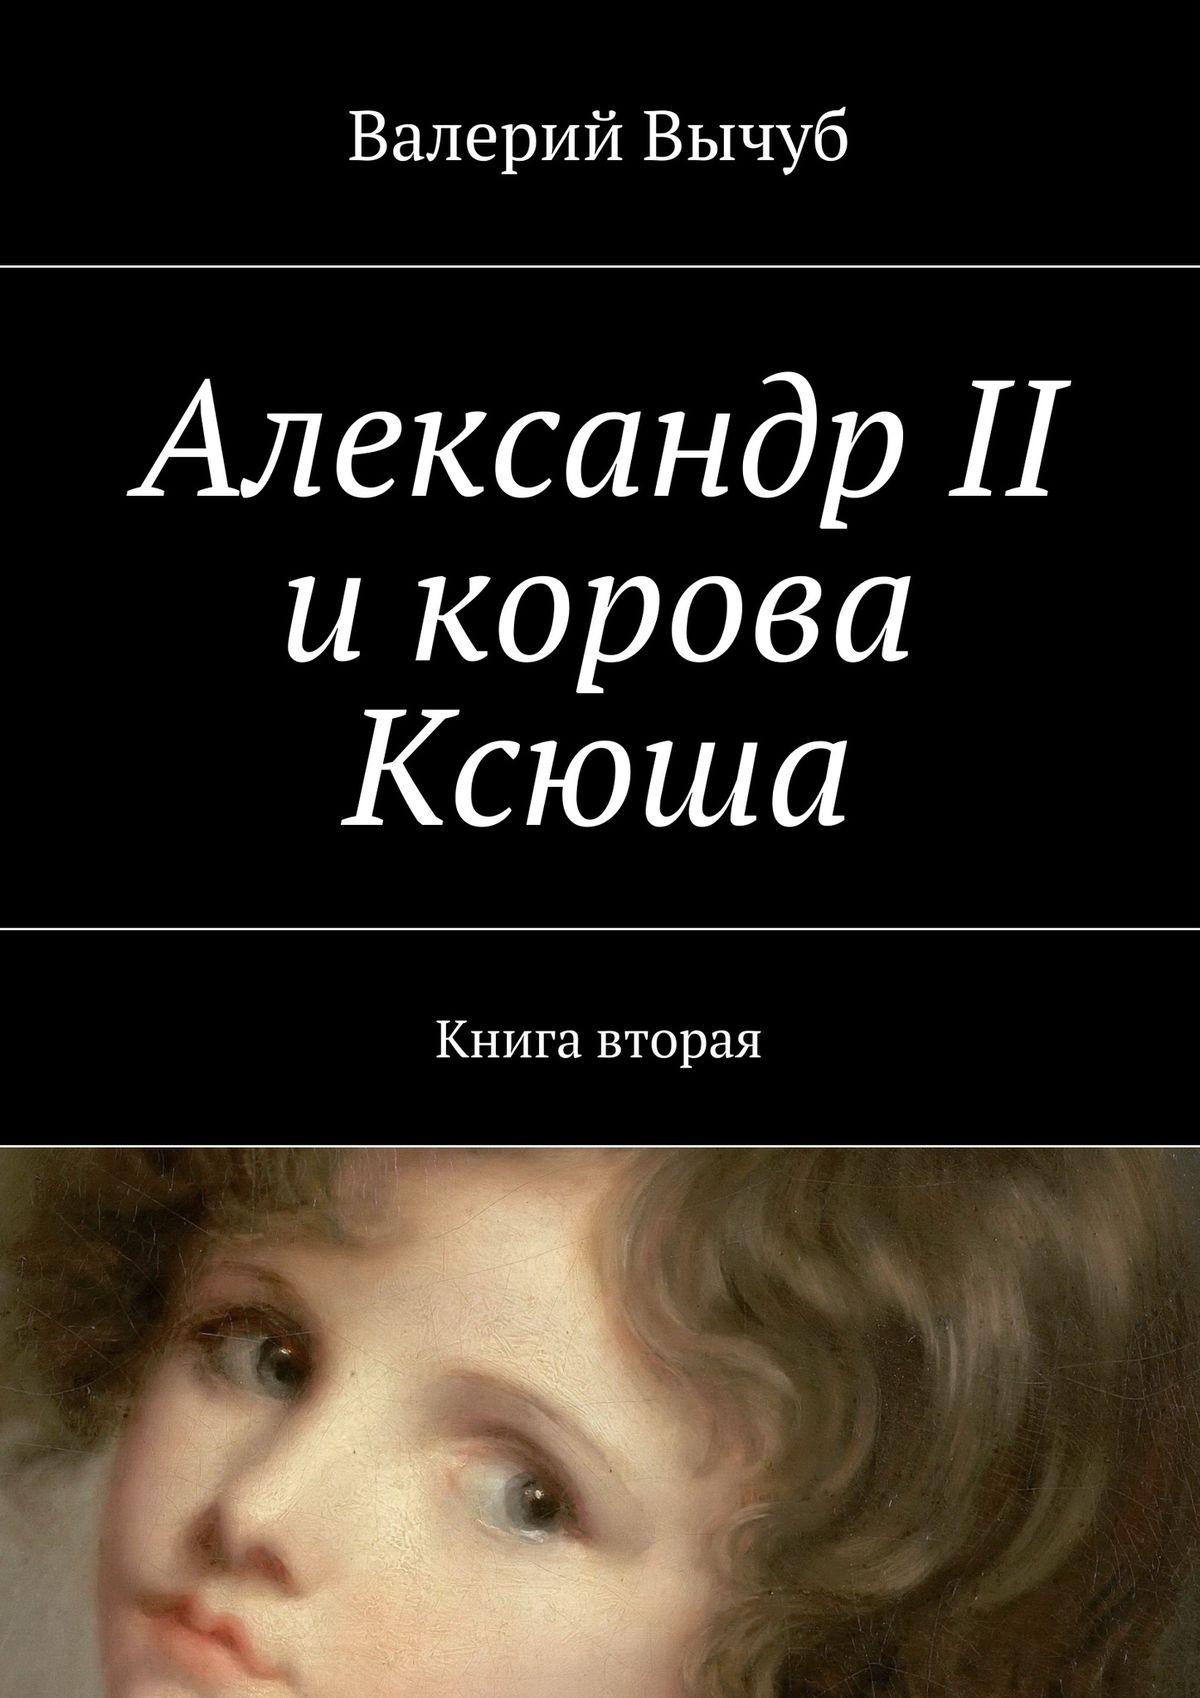 Александр II икорова Ксюша. Книга вторая